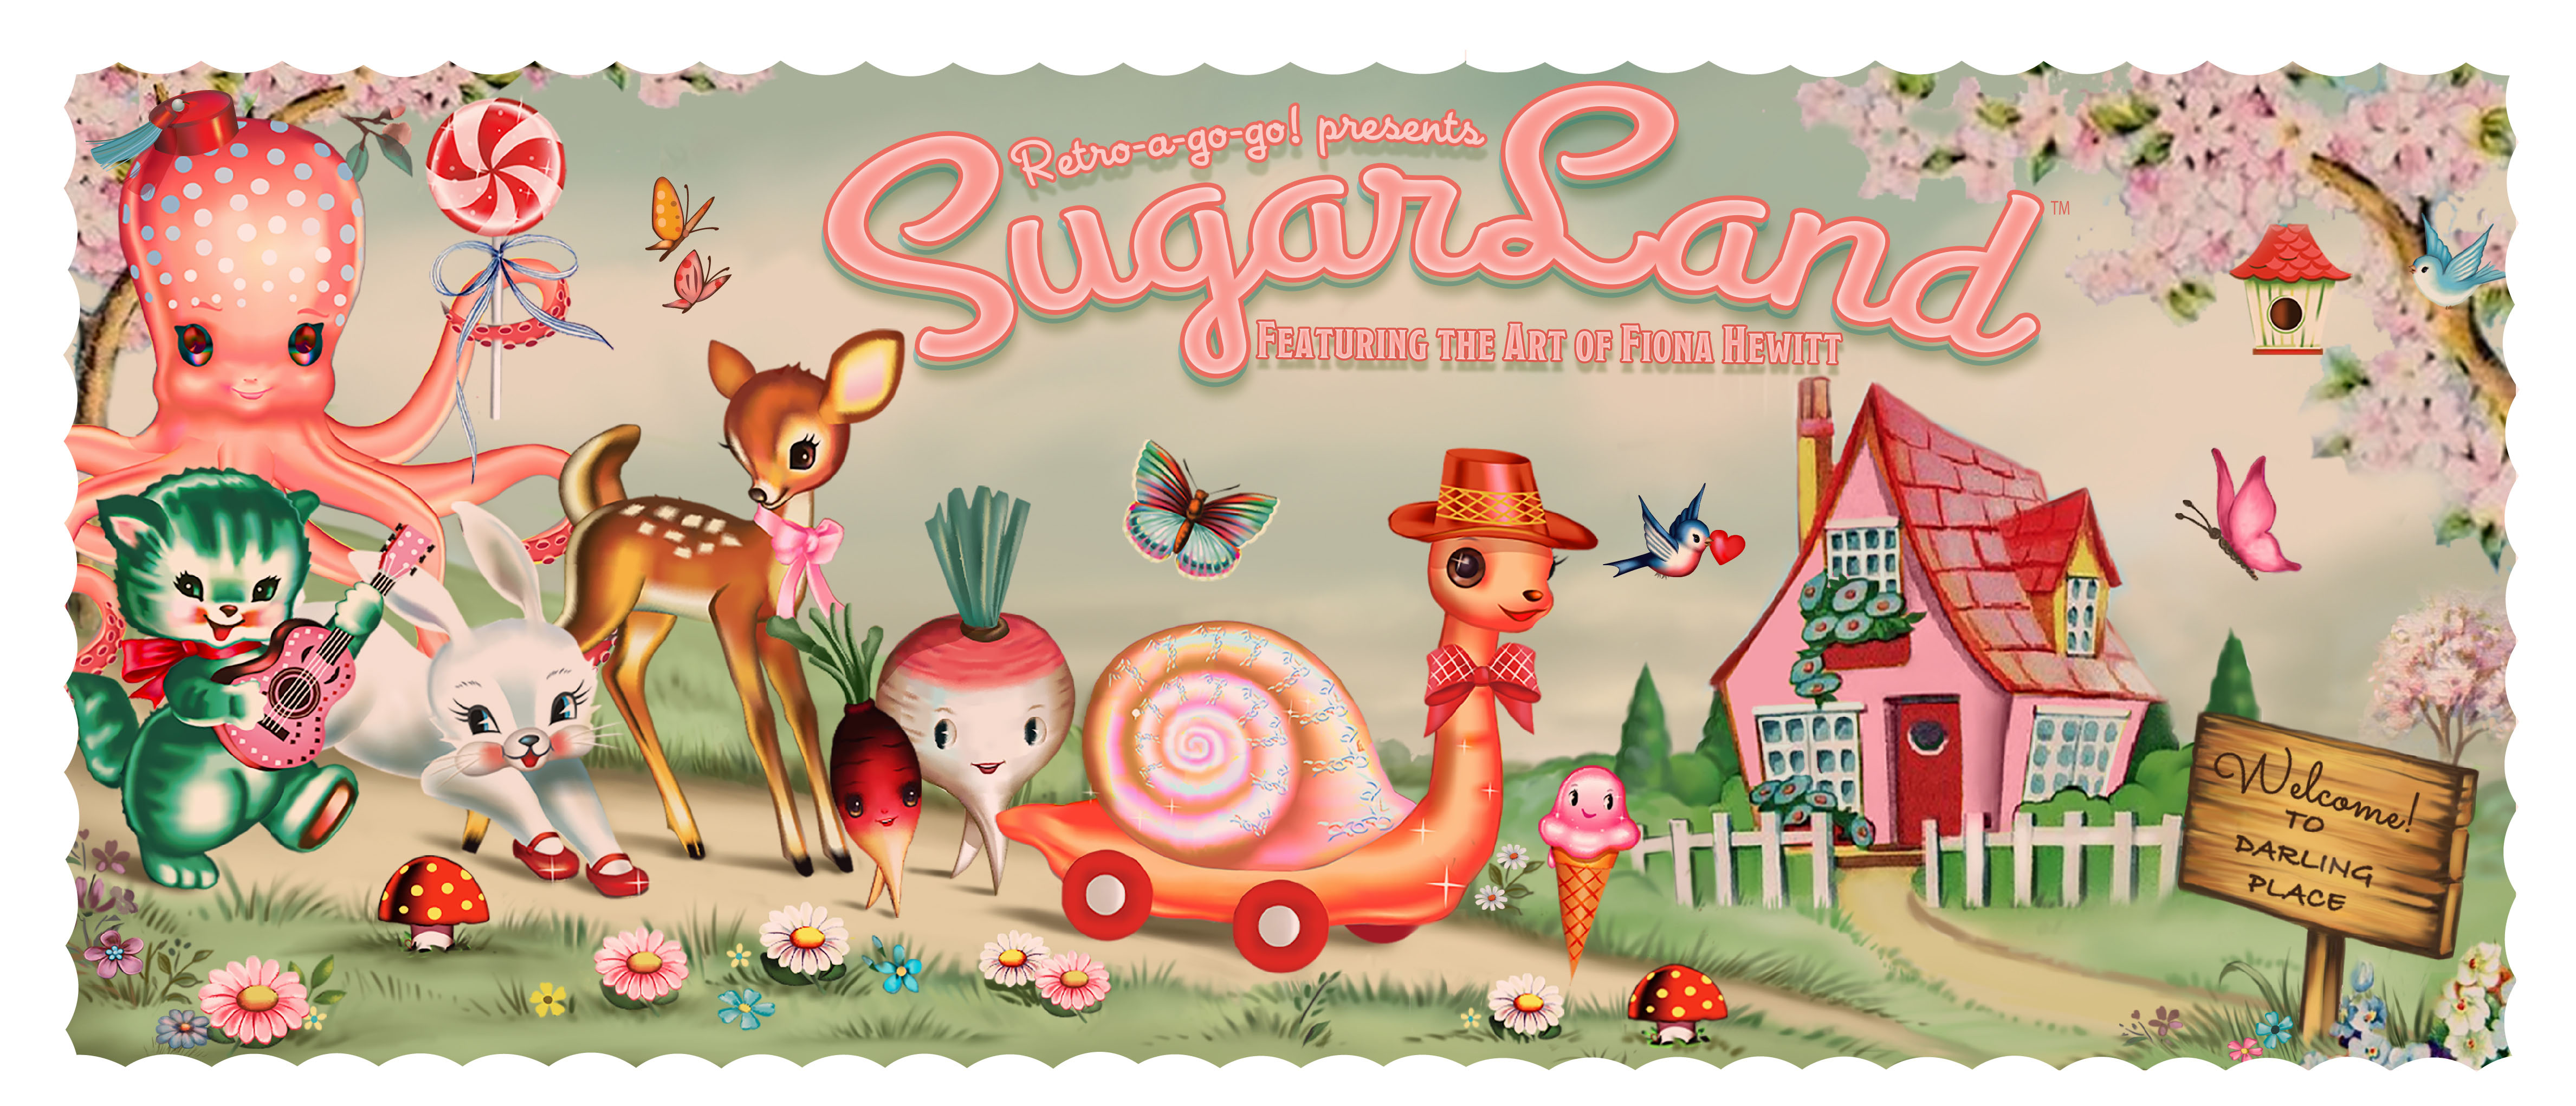 sugarland-category-header.jpg